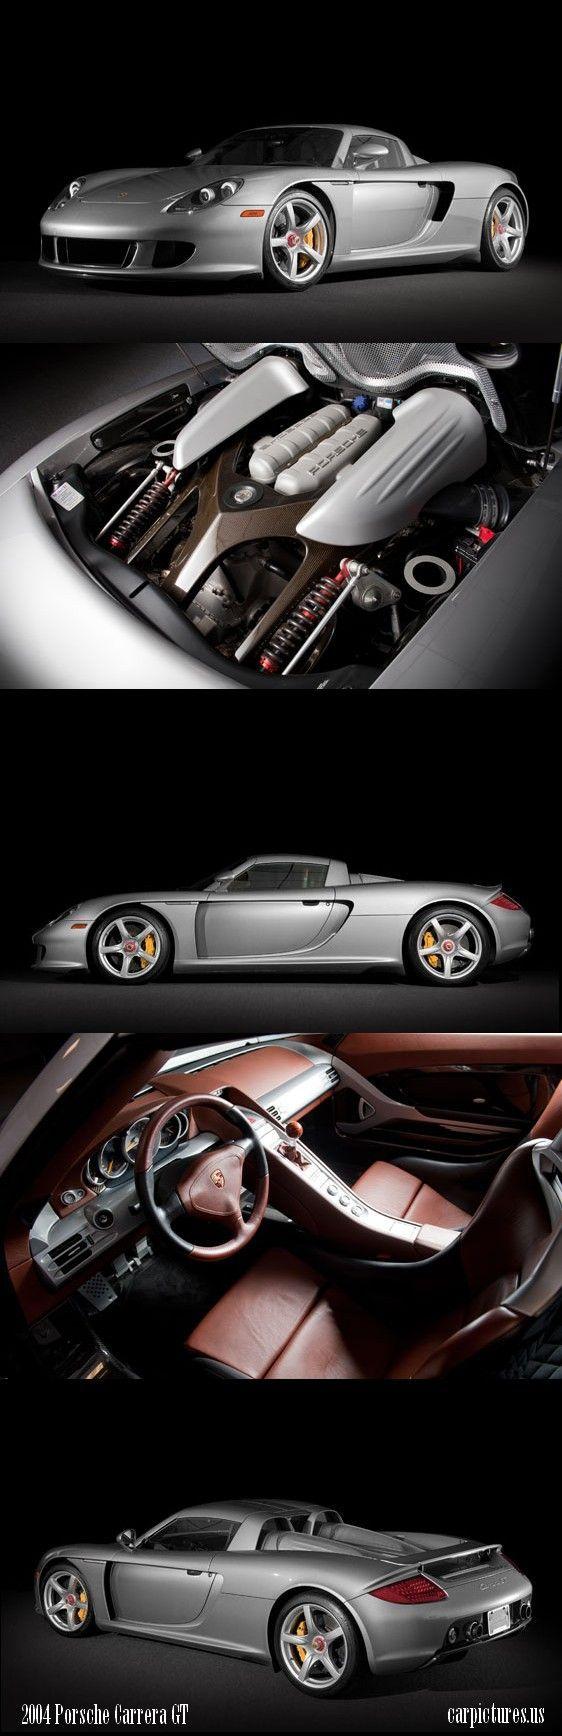 2004 Porsche Carrera GT. Source: RM Auctions. ✏✏✏✏✏✏✏✏✏✏✏✏✏✏✏✏ AUTRES VEHICULES - OTHER VEHICLES ☞ https://fr.pinterest.com/barbierjeanf/pin-index-voitures-v%C3%A9hicules/ ══════════════════════ BIJOUX ☞ https://www.facebook.com/media/set/?set=a.1351591571533839&type=1&l=bb0129771f ✏✏✏✏✏✏✏✏✏✏✏✏✏✏✏✏